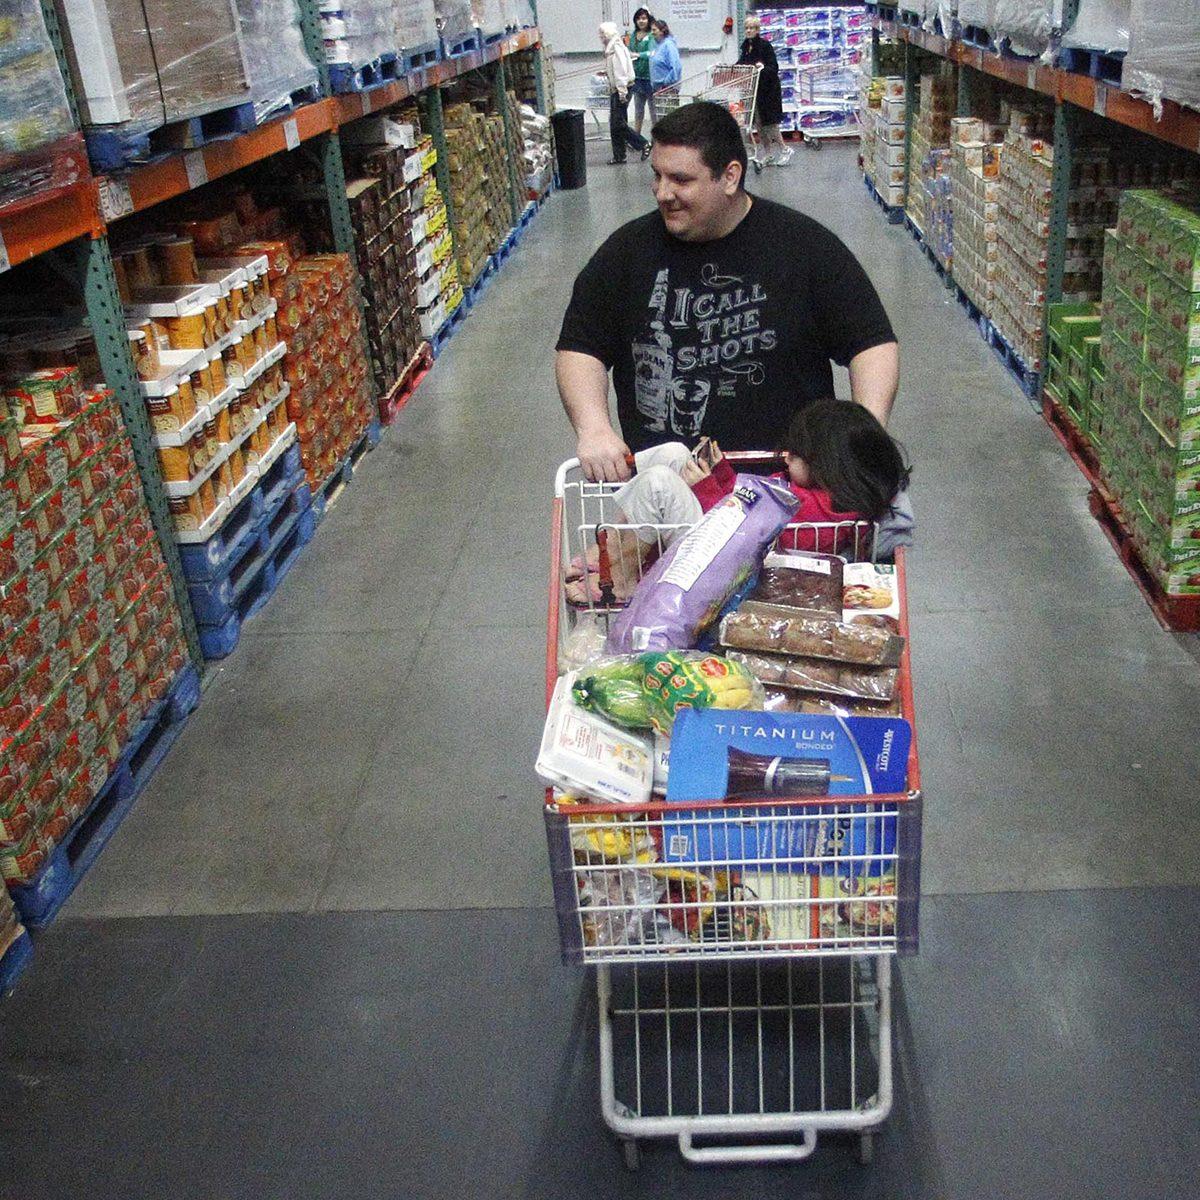 Browsing Costco aisles